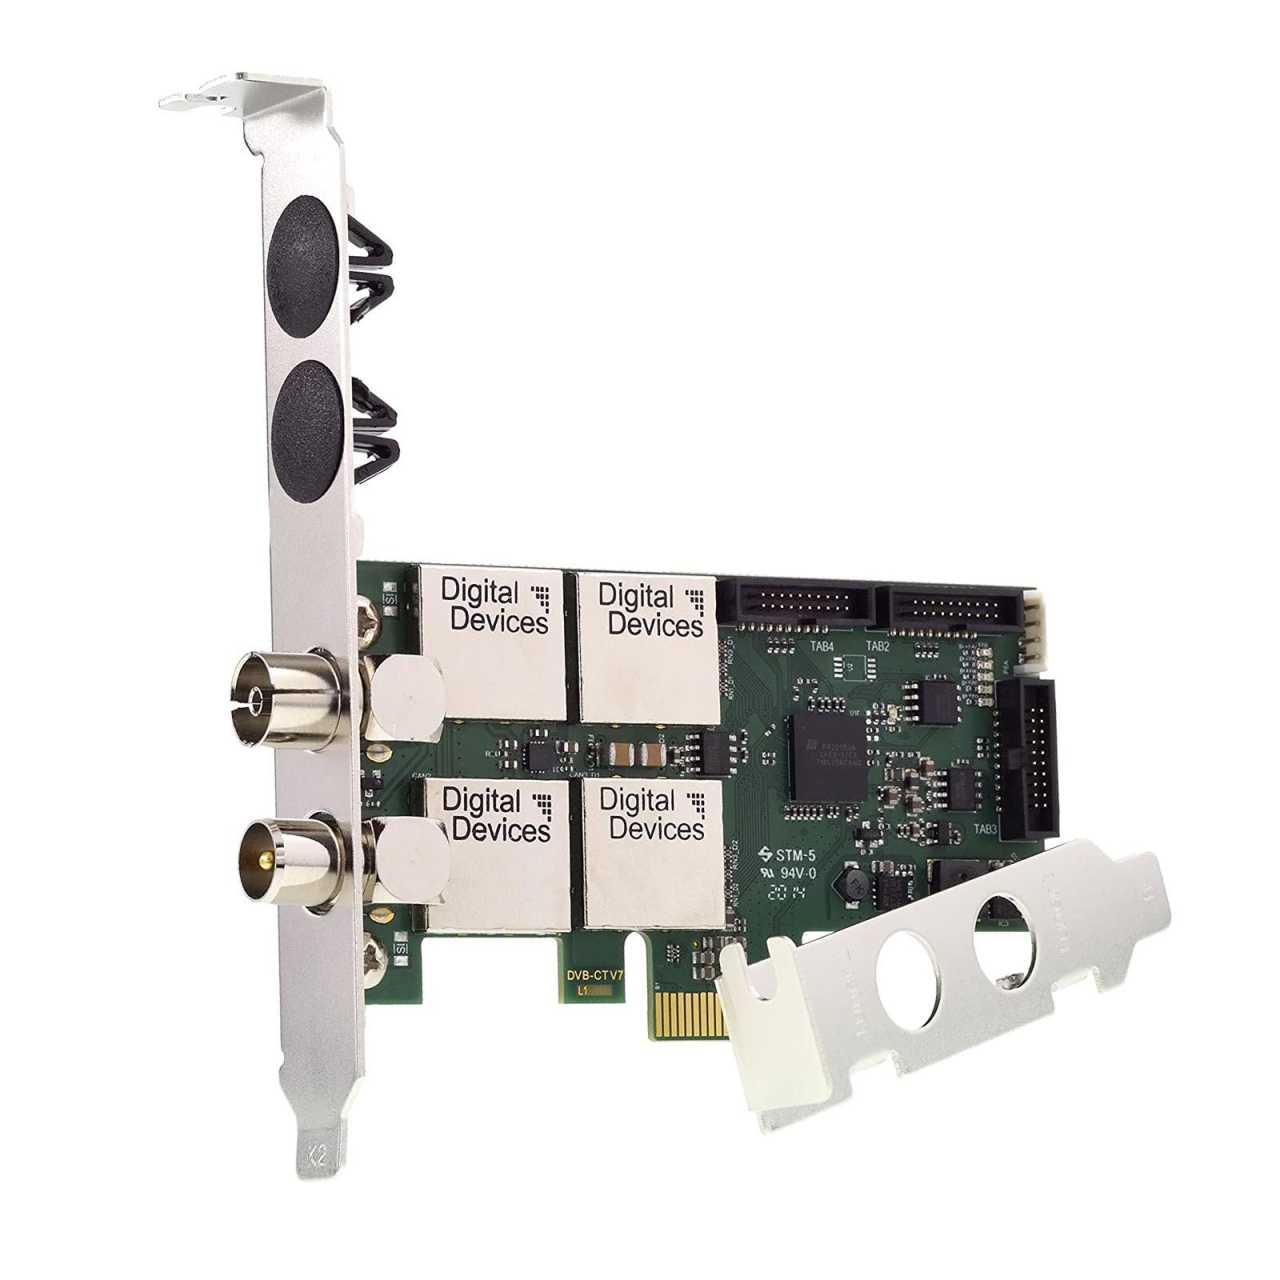 Digital Devices Cine C2/T2I V7 - Twin Tuner TV Karte DVB-C/C2/T/T2/ISDB - Einkabelsystem TVDVBC02